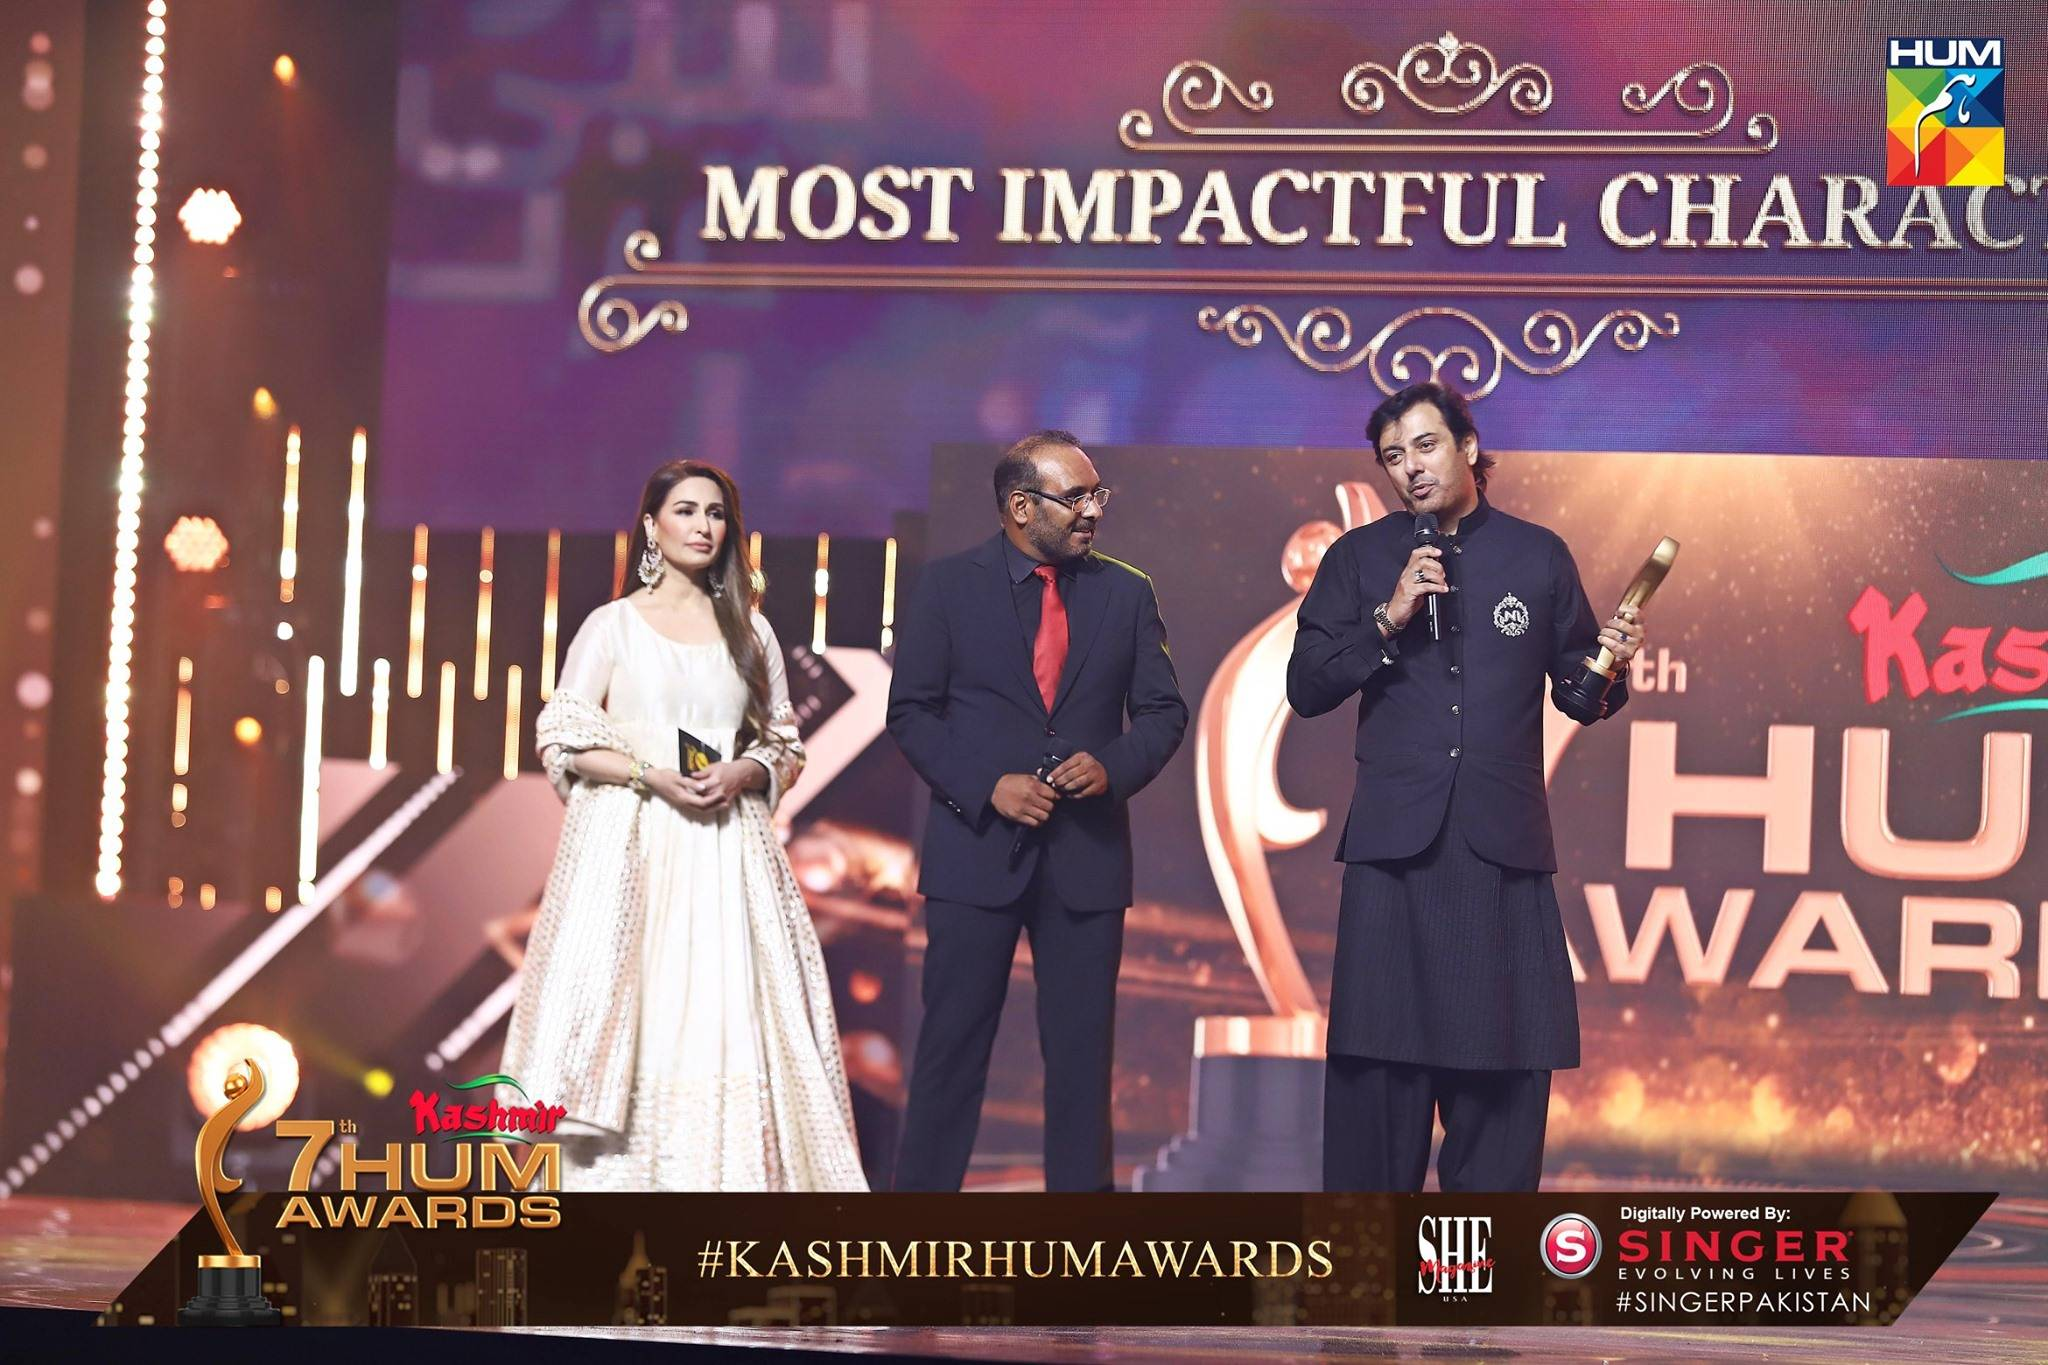 Hum Awards